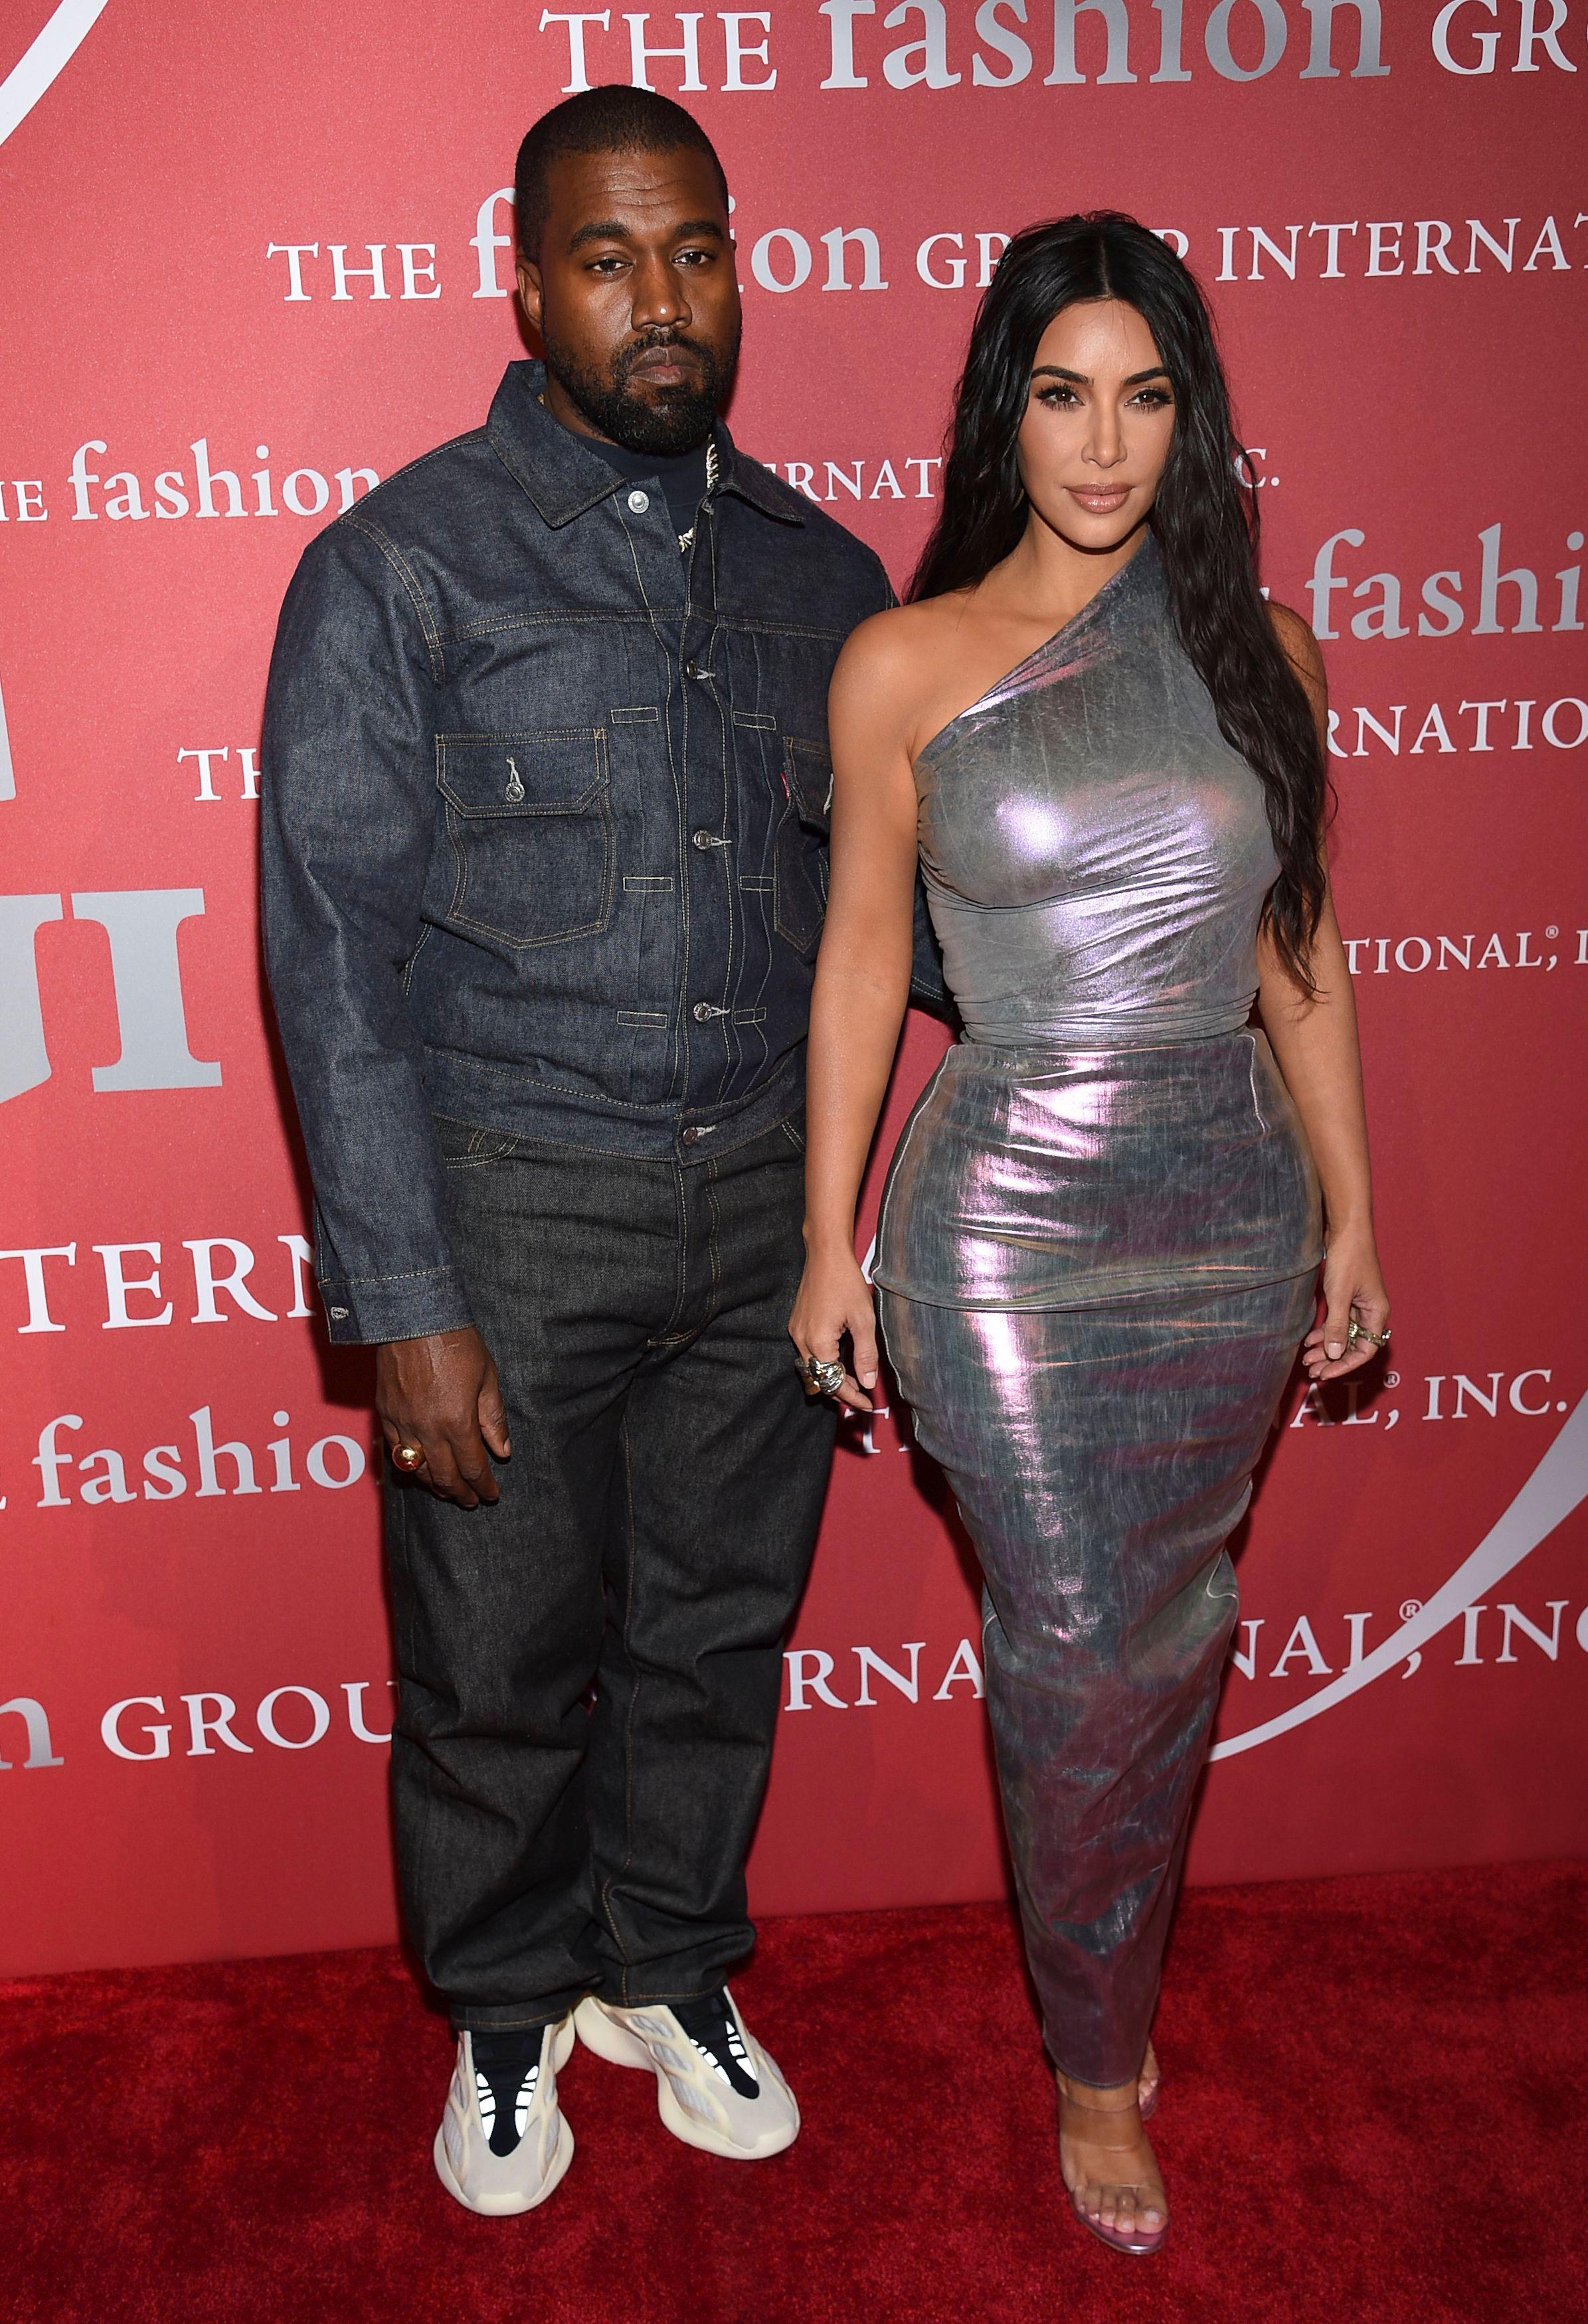 Kim Kardashian Shares Throwback Wedding Dress Photo Amid Drama